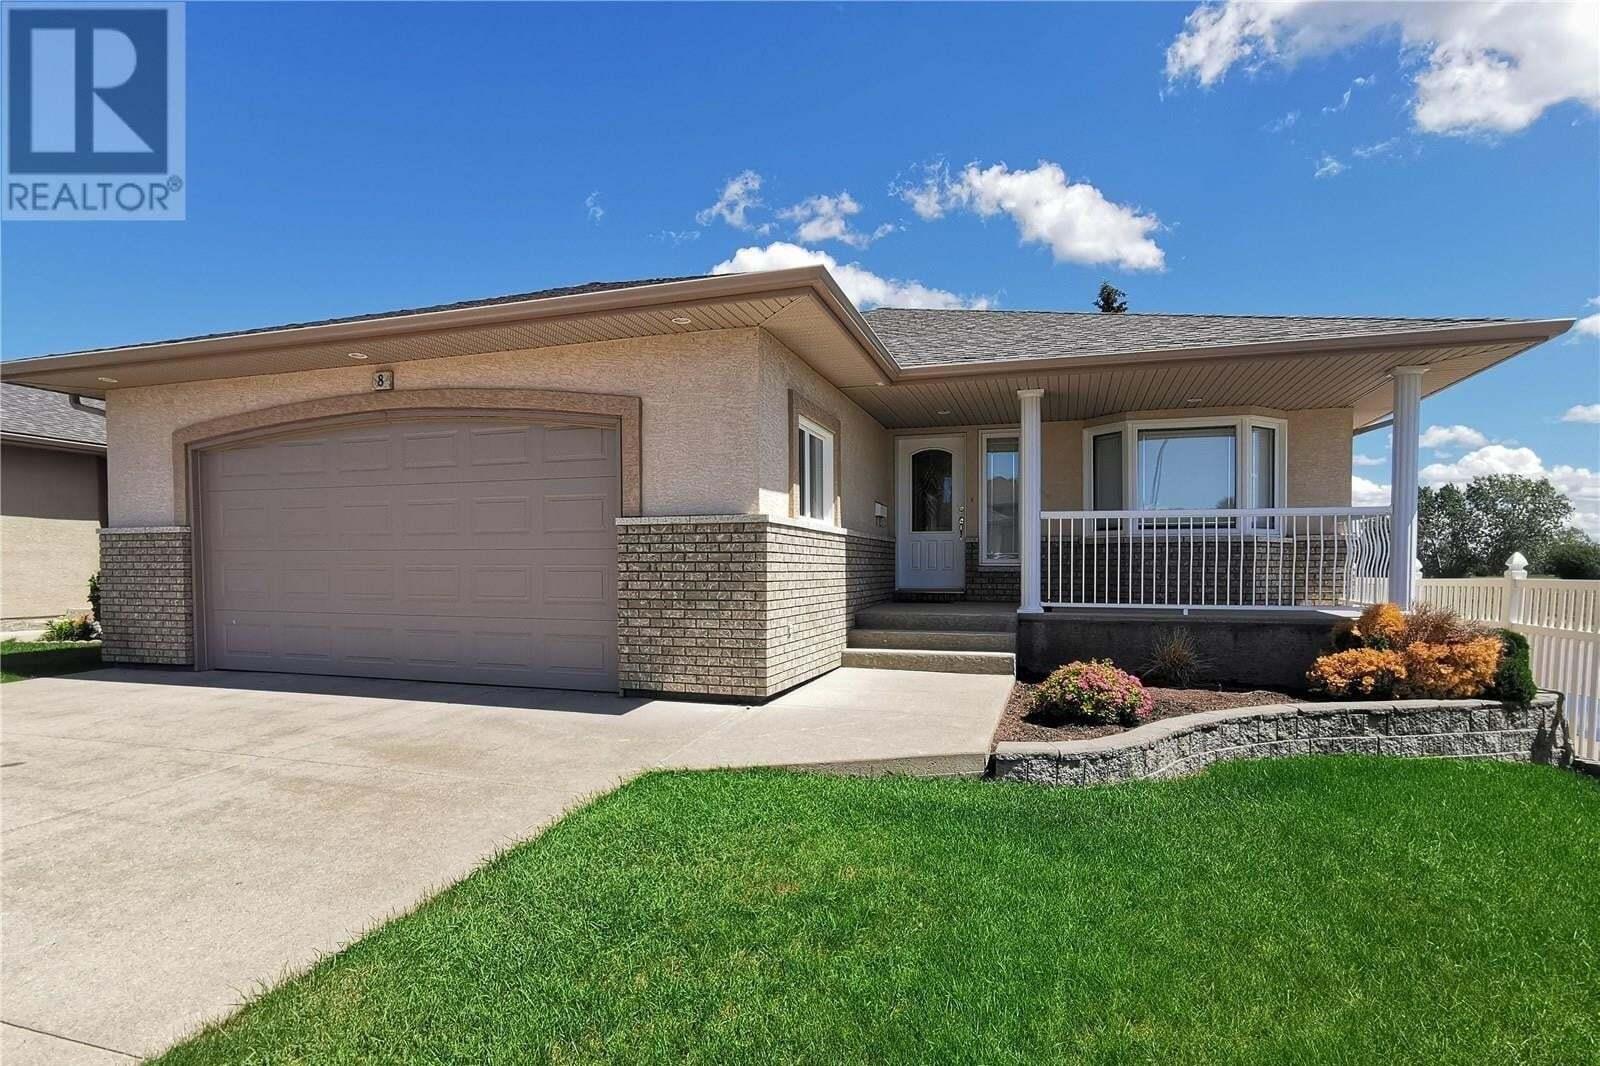 House for sale at 1 Wintergreen Dr Unit 8 Moose Jaw Saskatchewan - MLS: SK814886